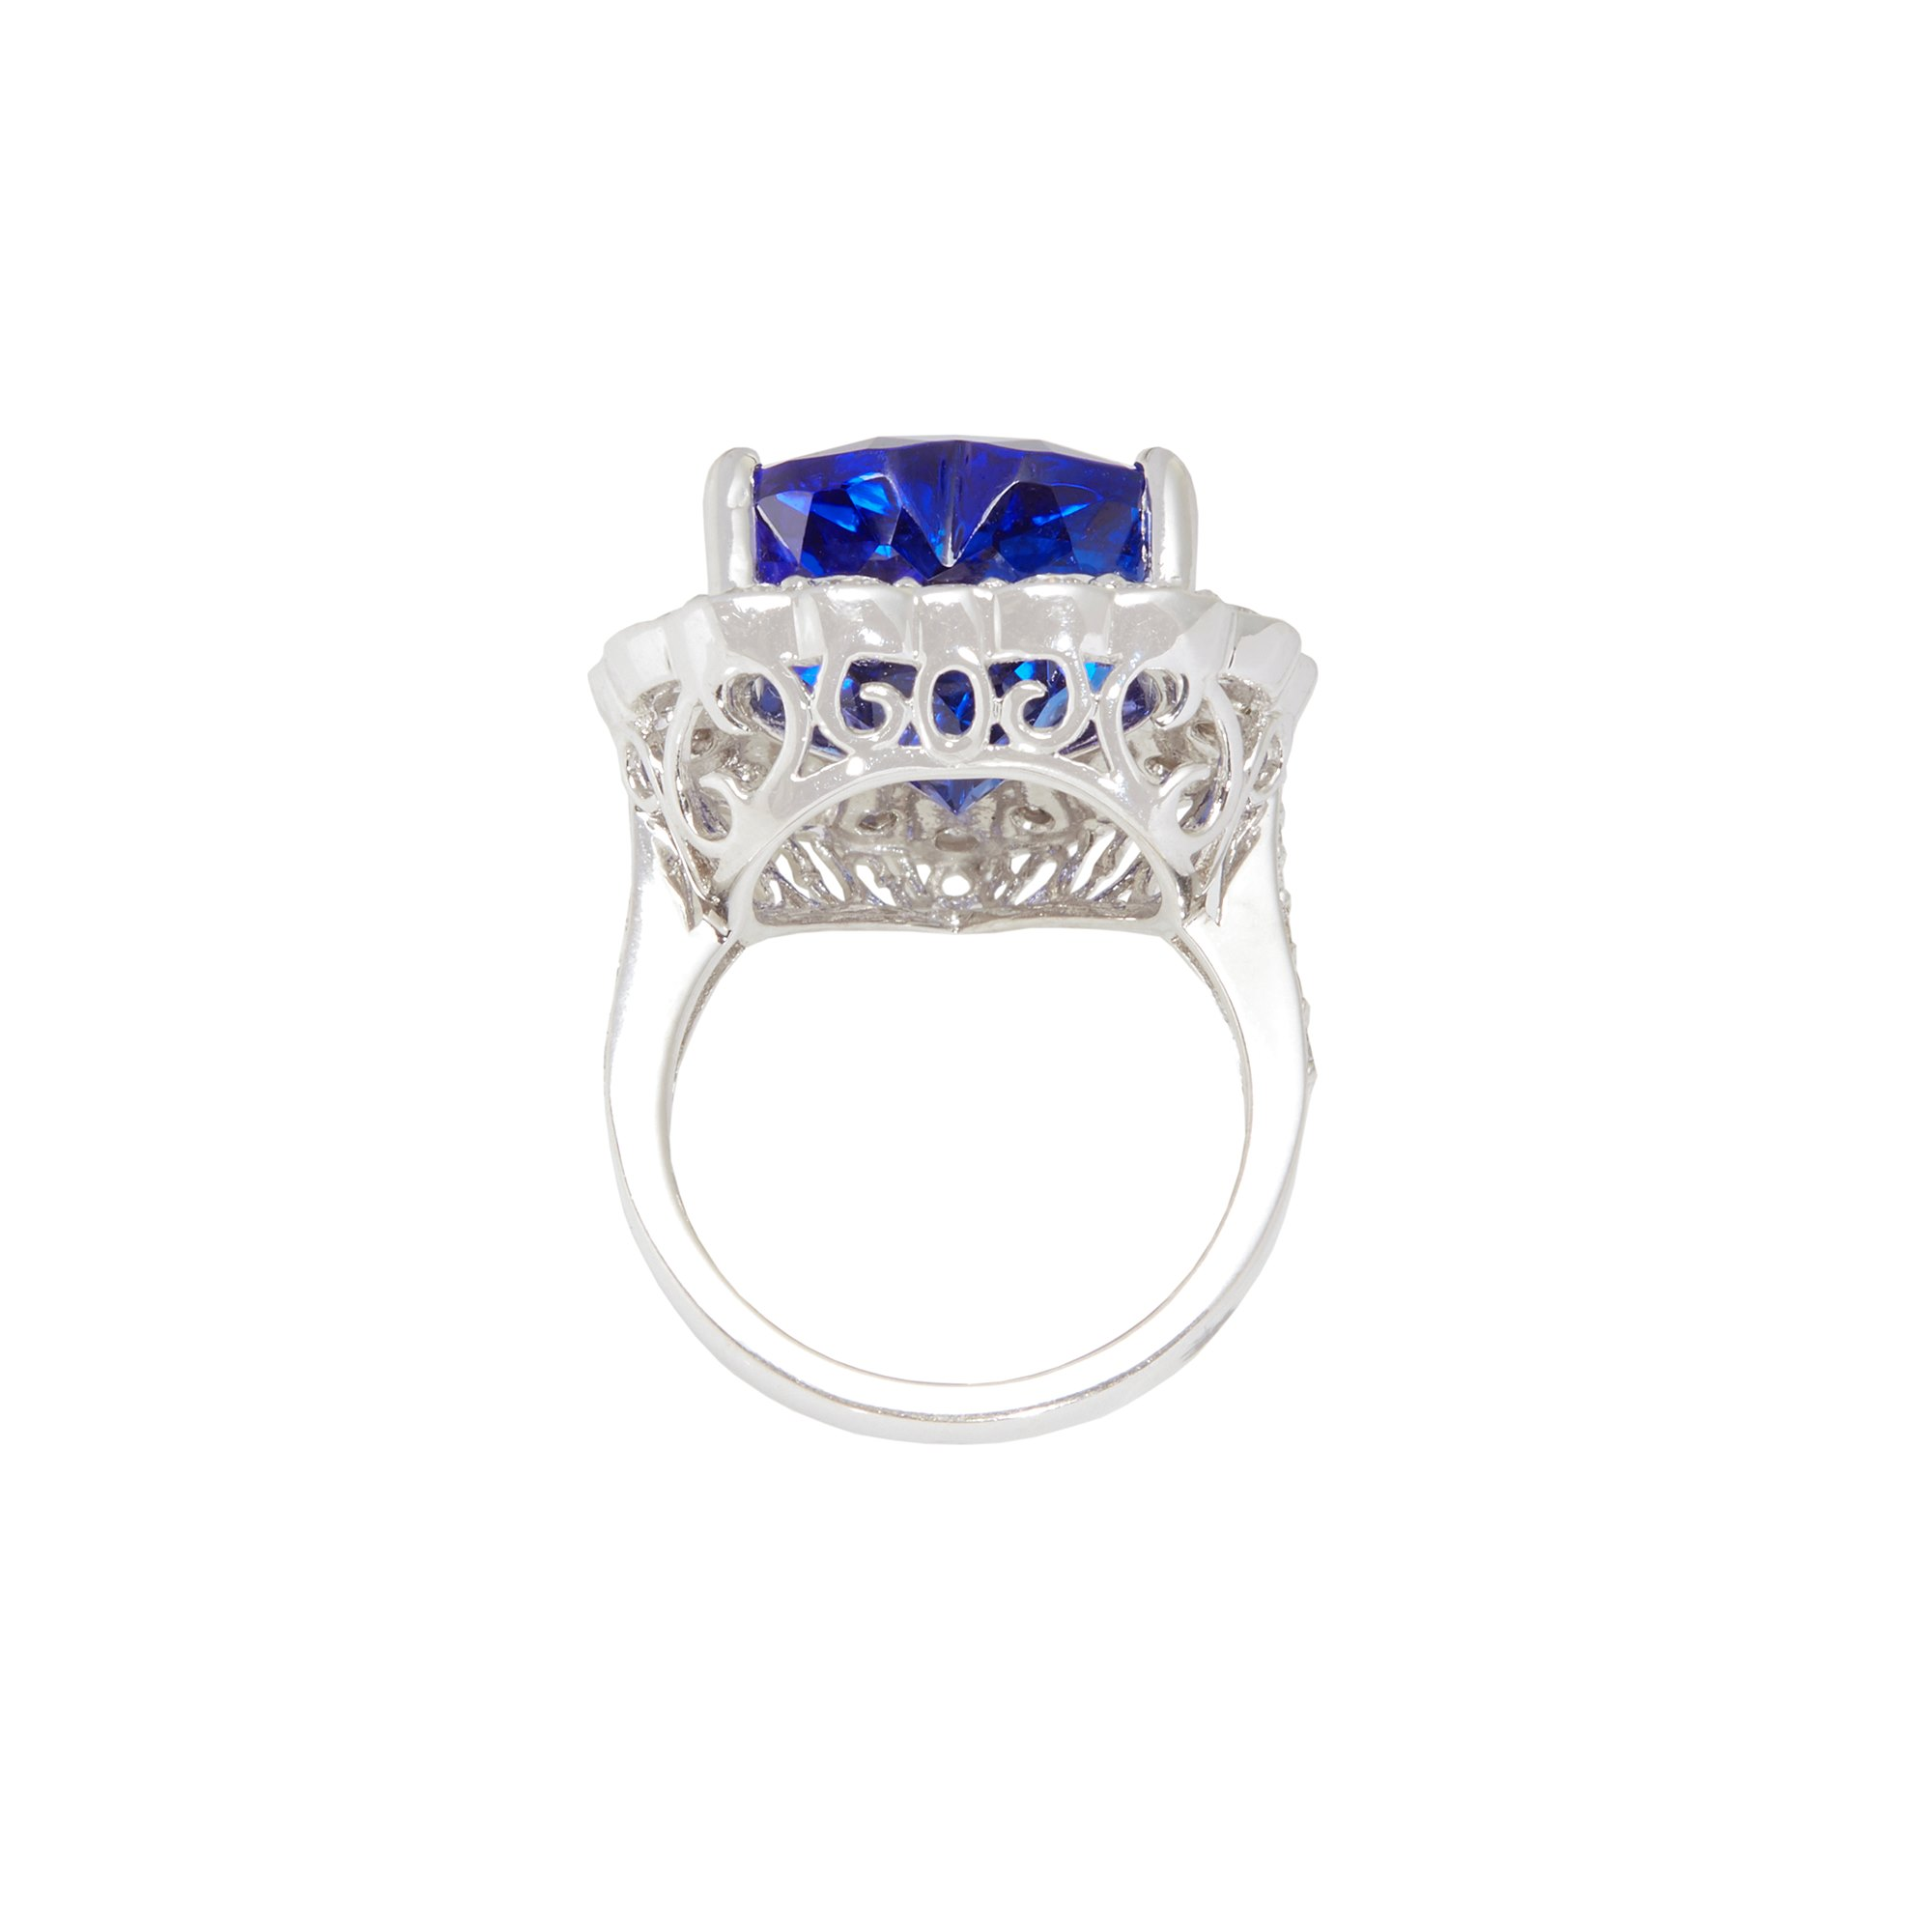 David Jerome Certified 15.44ct Untreated Heart Cut Tanzanite and Diamond Ring